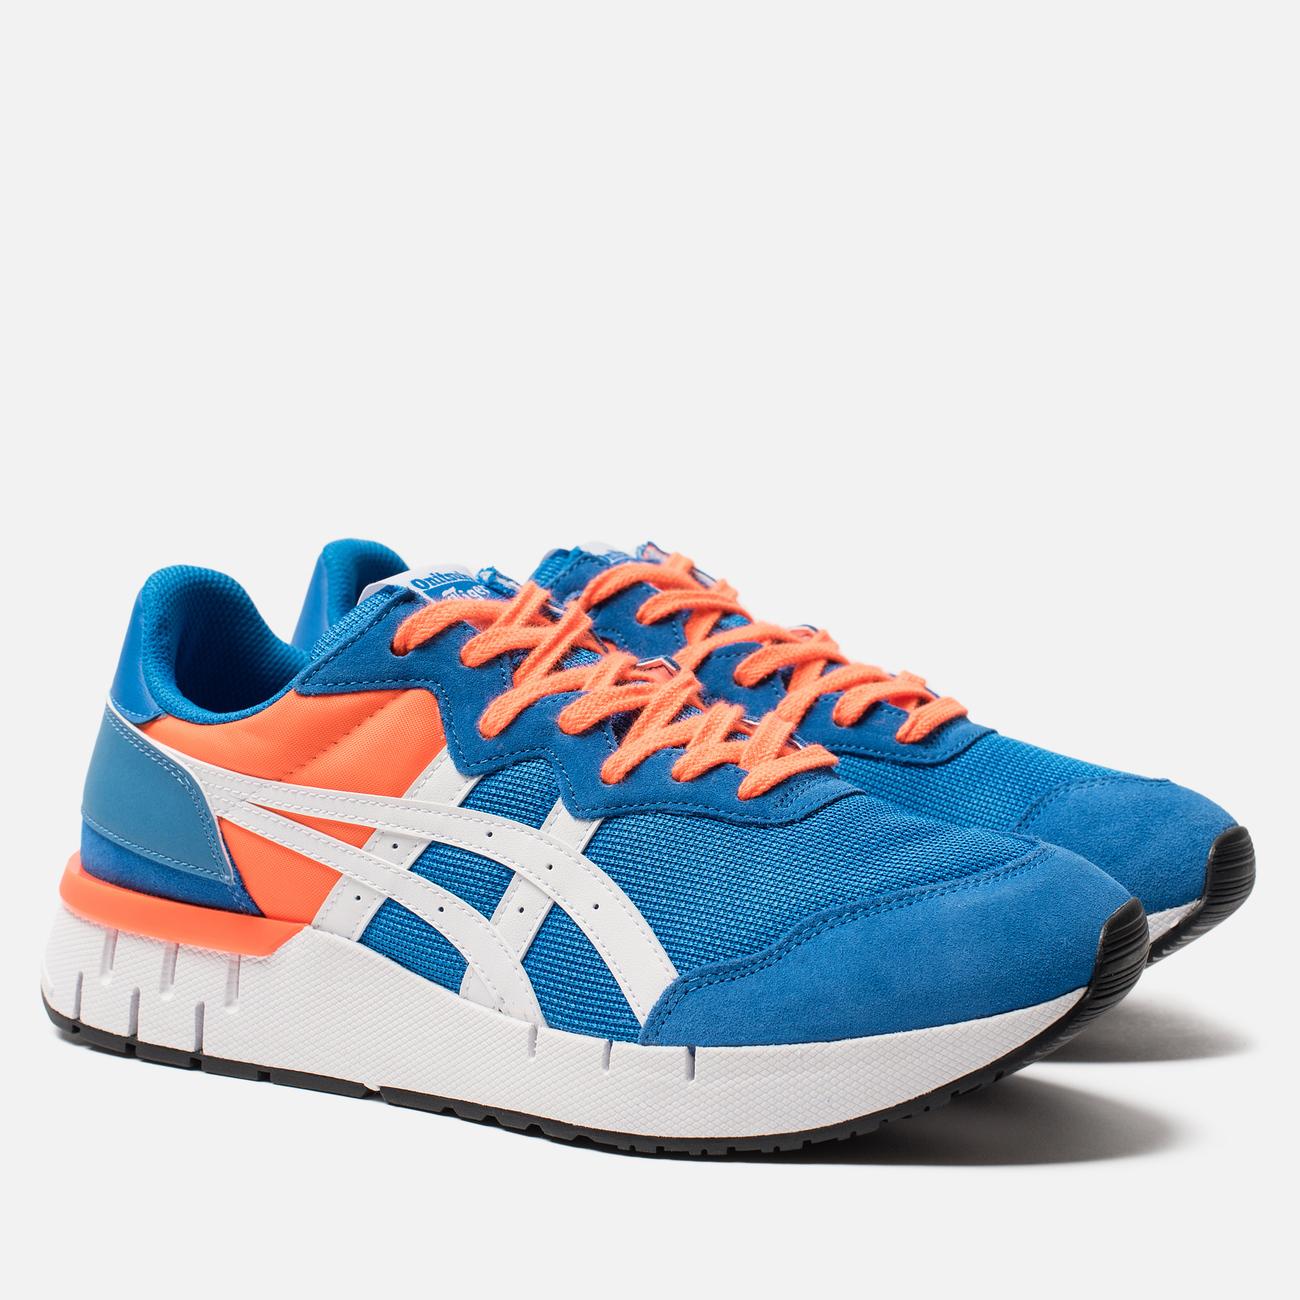 Мужские кроссовки Onitsuka Tiger Rebilac Runner Electric Blue/White